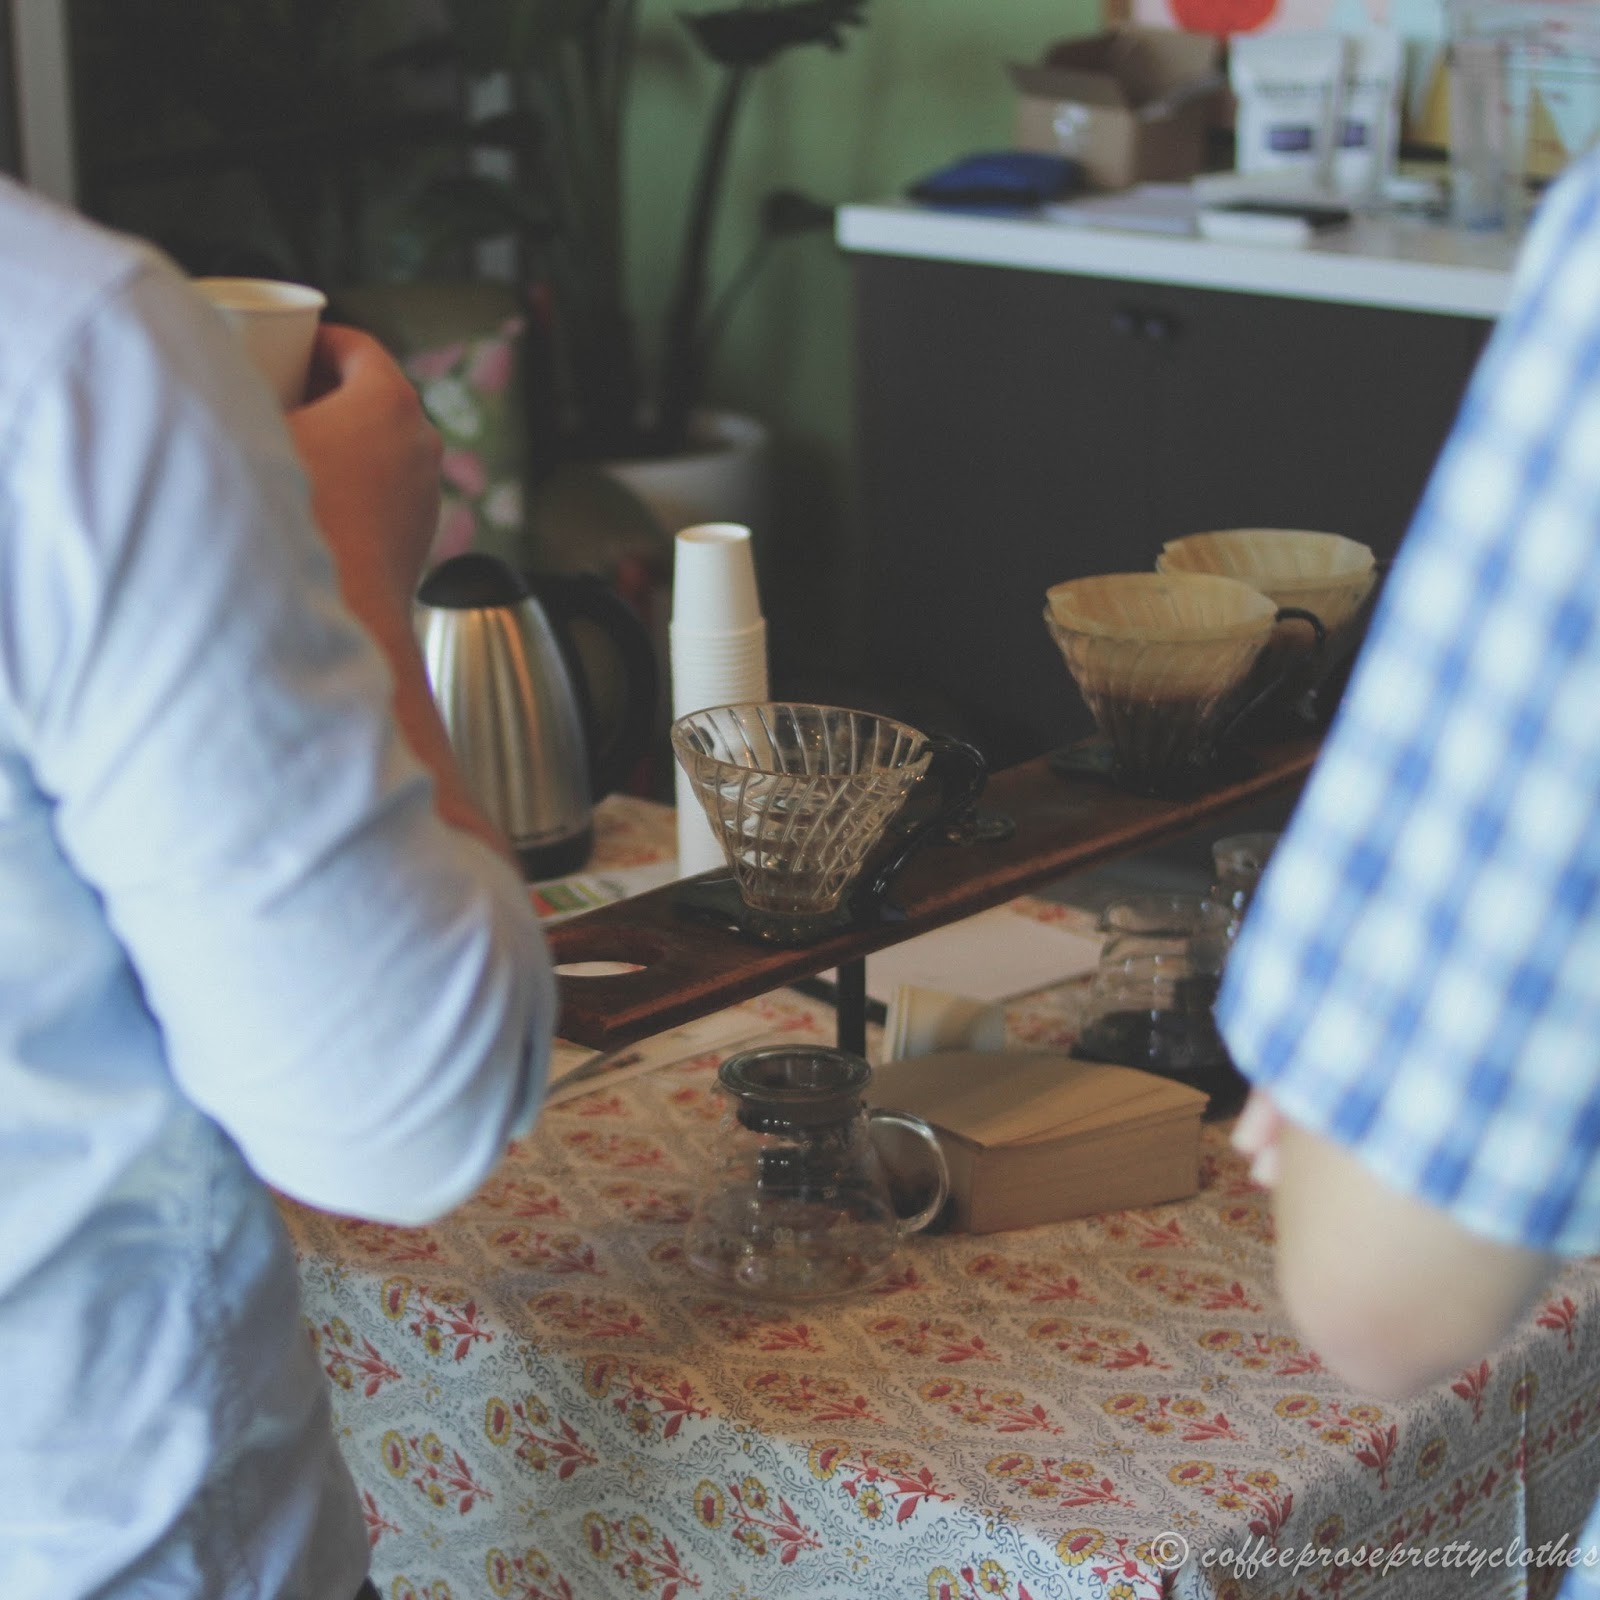 Coffee brewing, the Wydown, Coffee roasting,